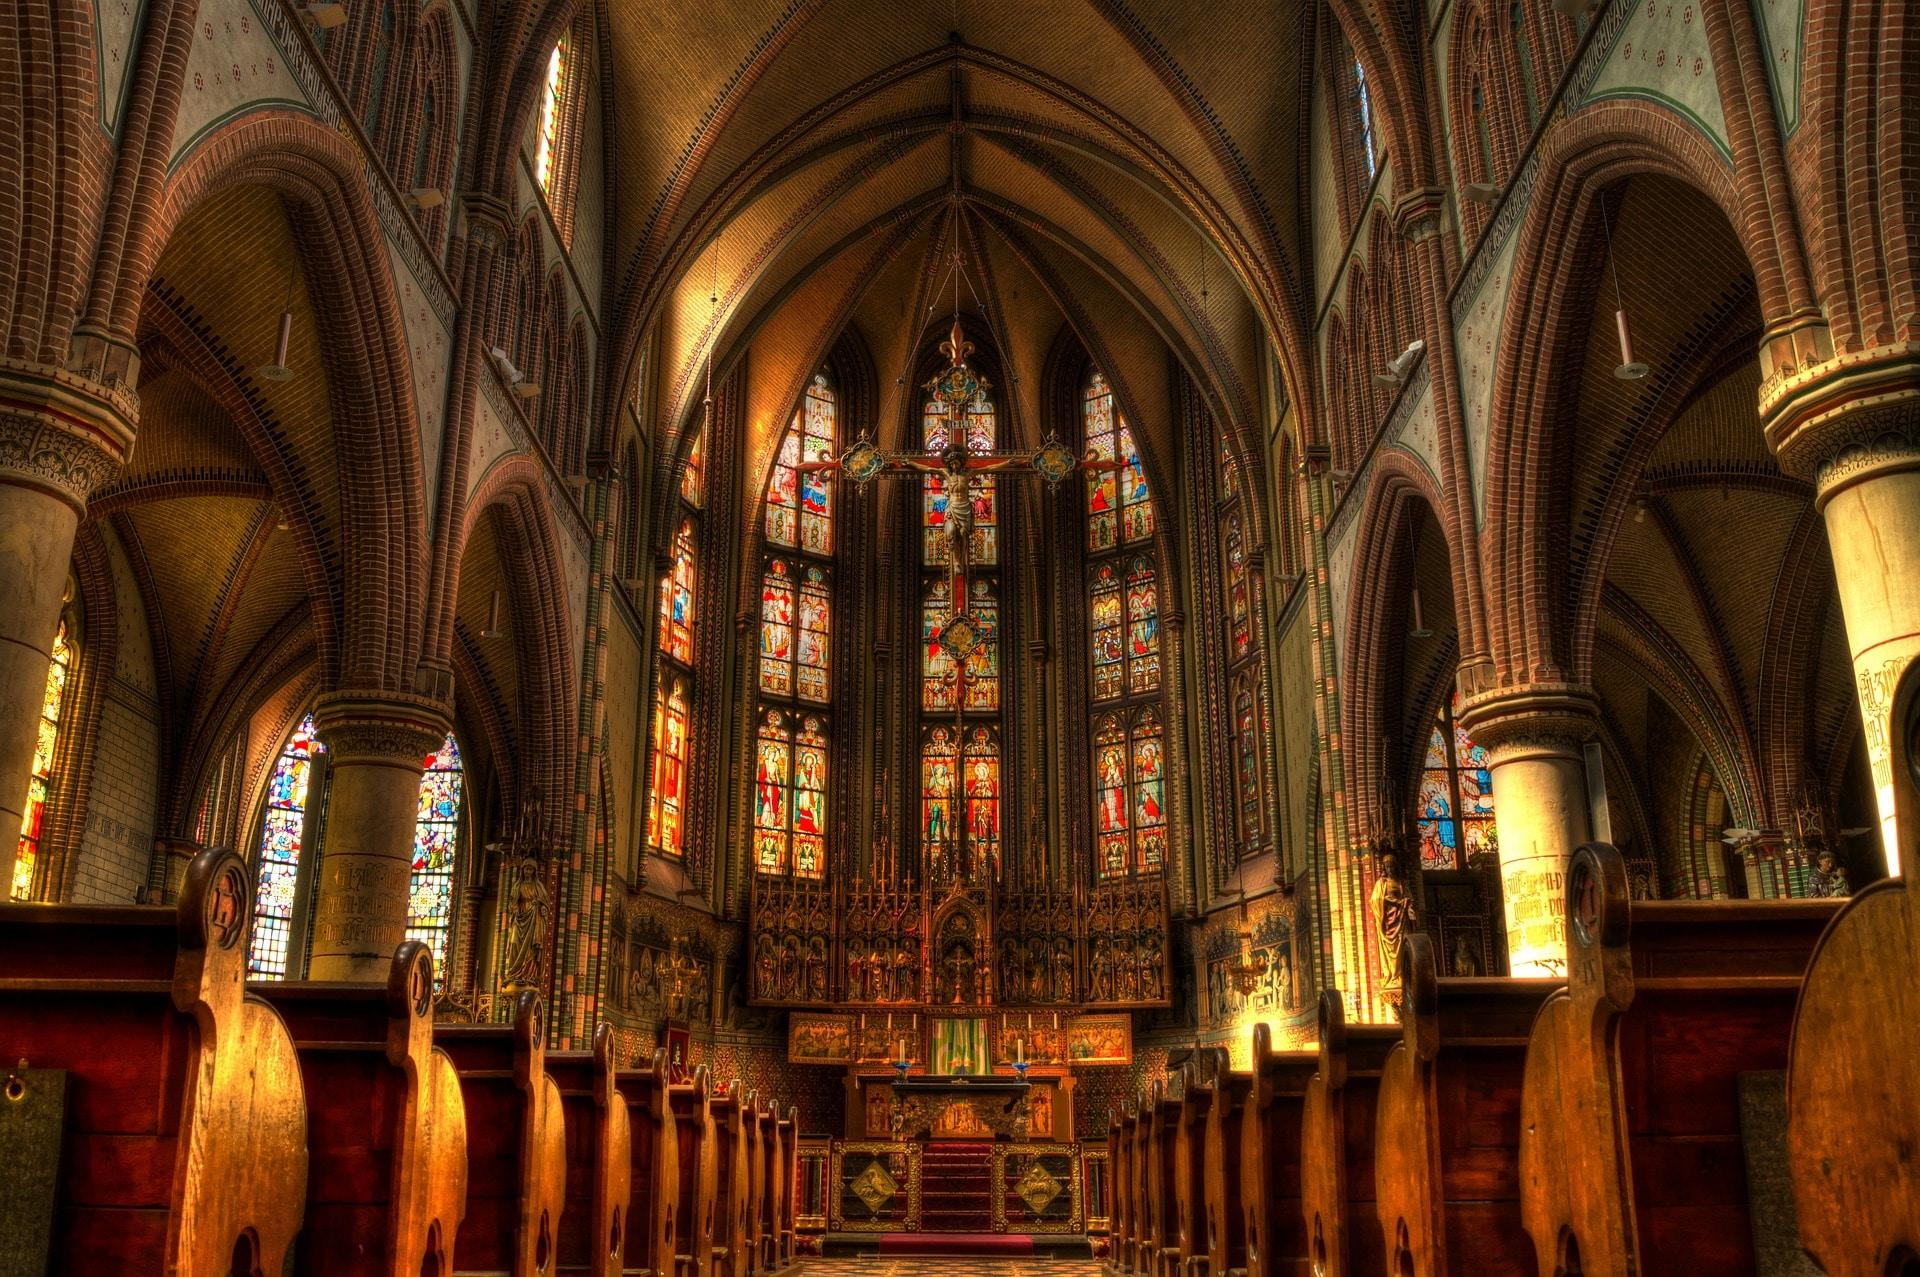 L'église, là où l'on prononce l'éloge funèbre